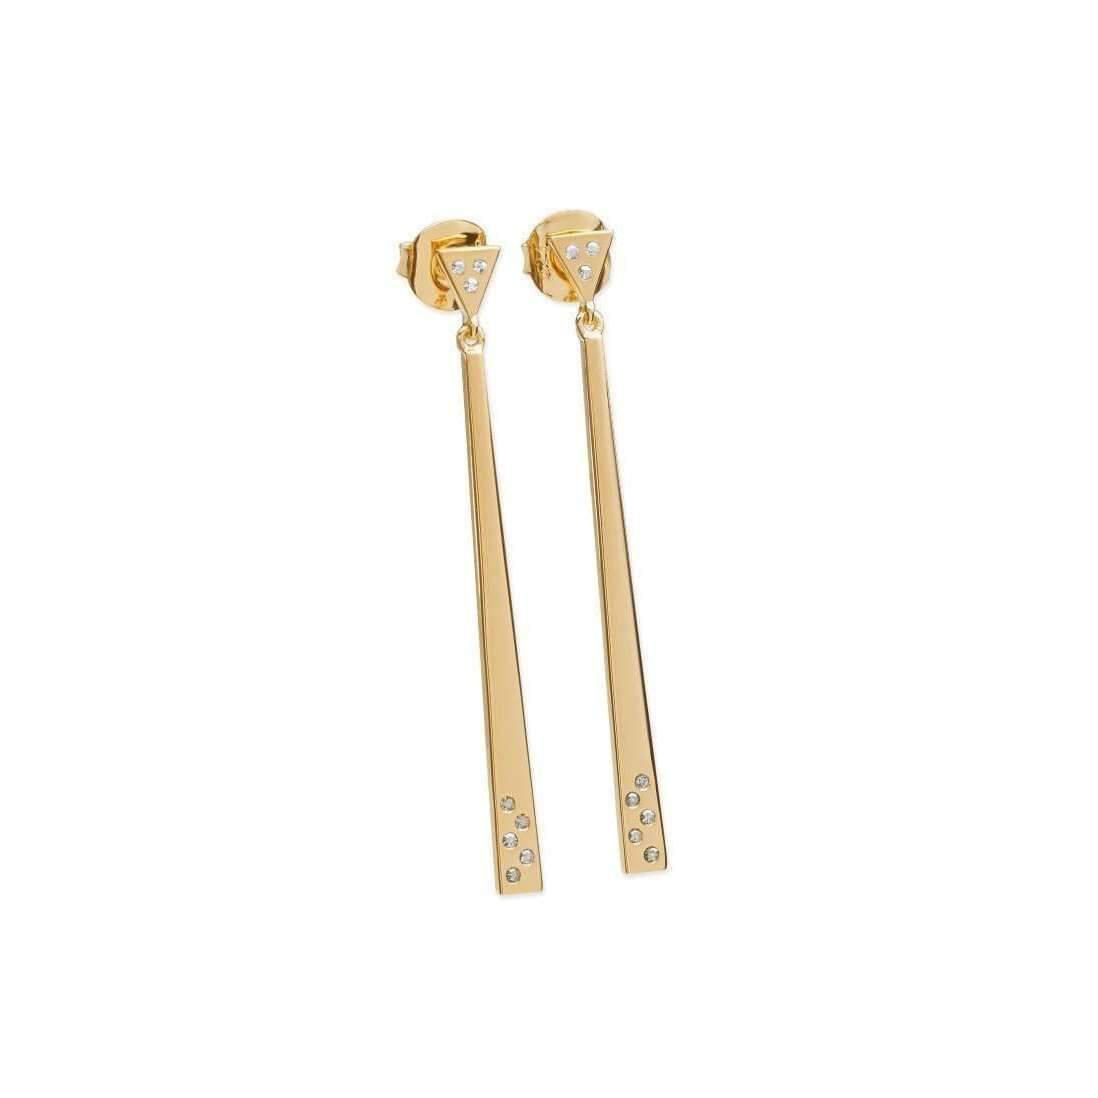 Lucy Quartermaine Art Deco Double Strand Earrings NgIHi